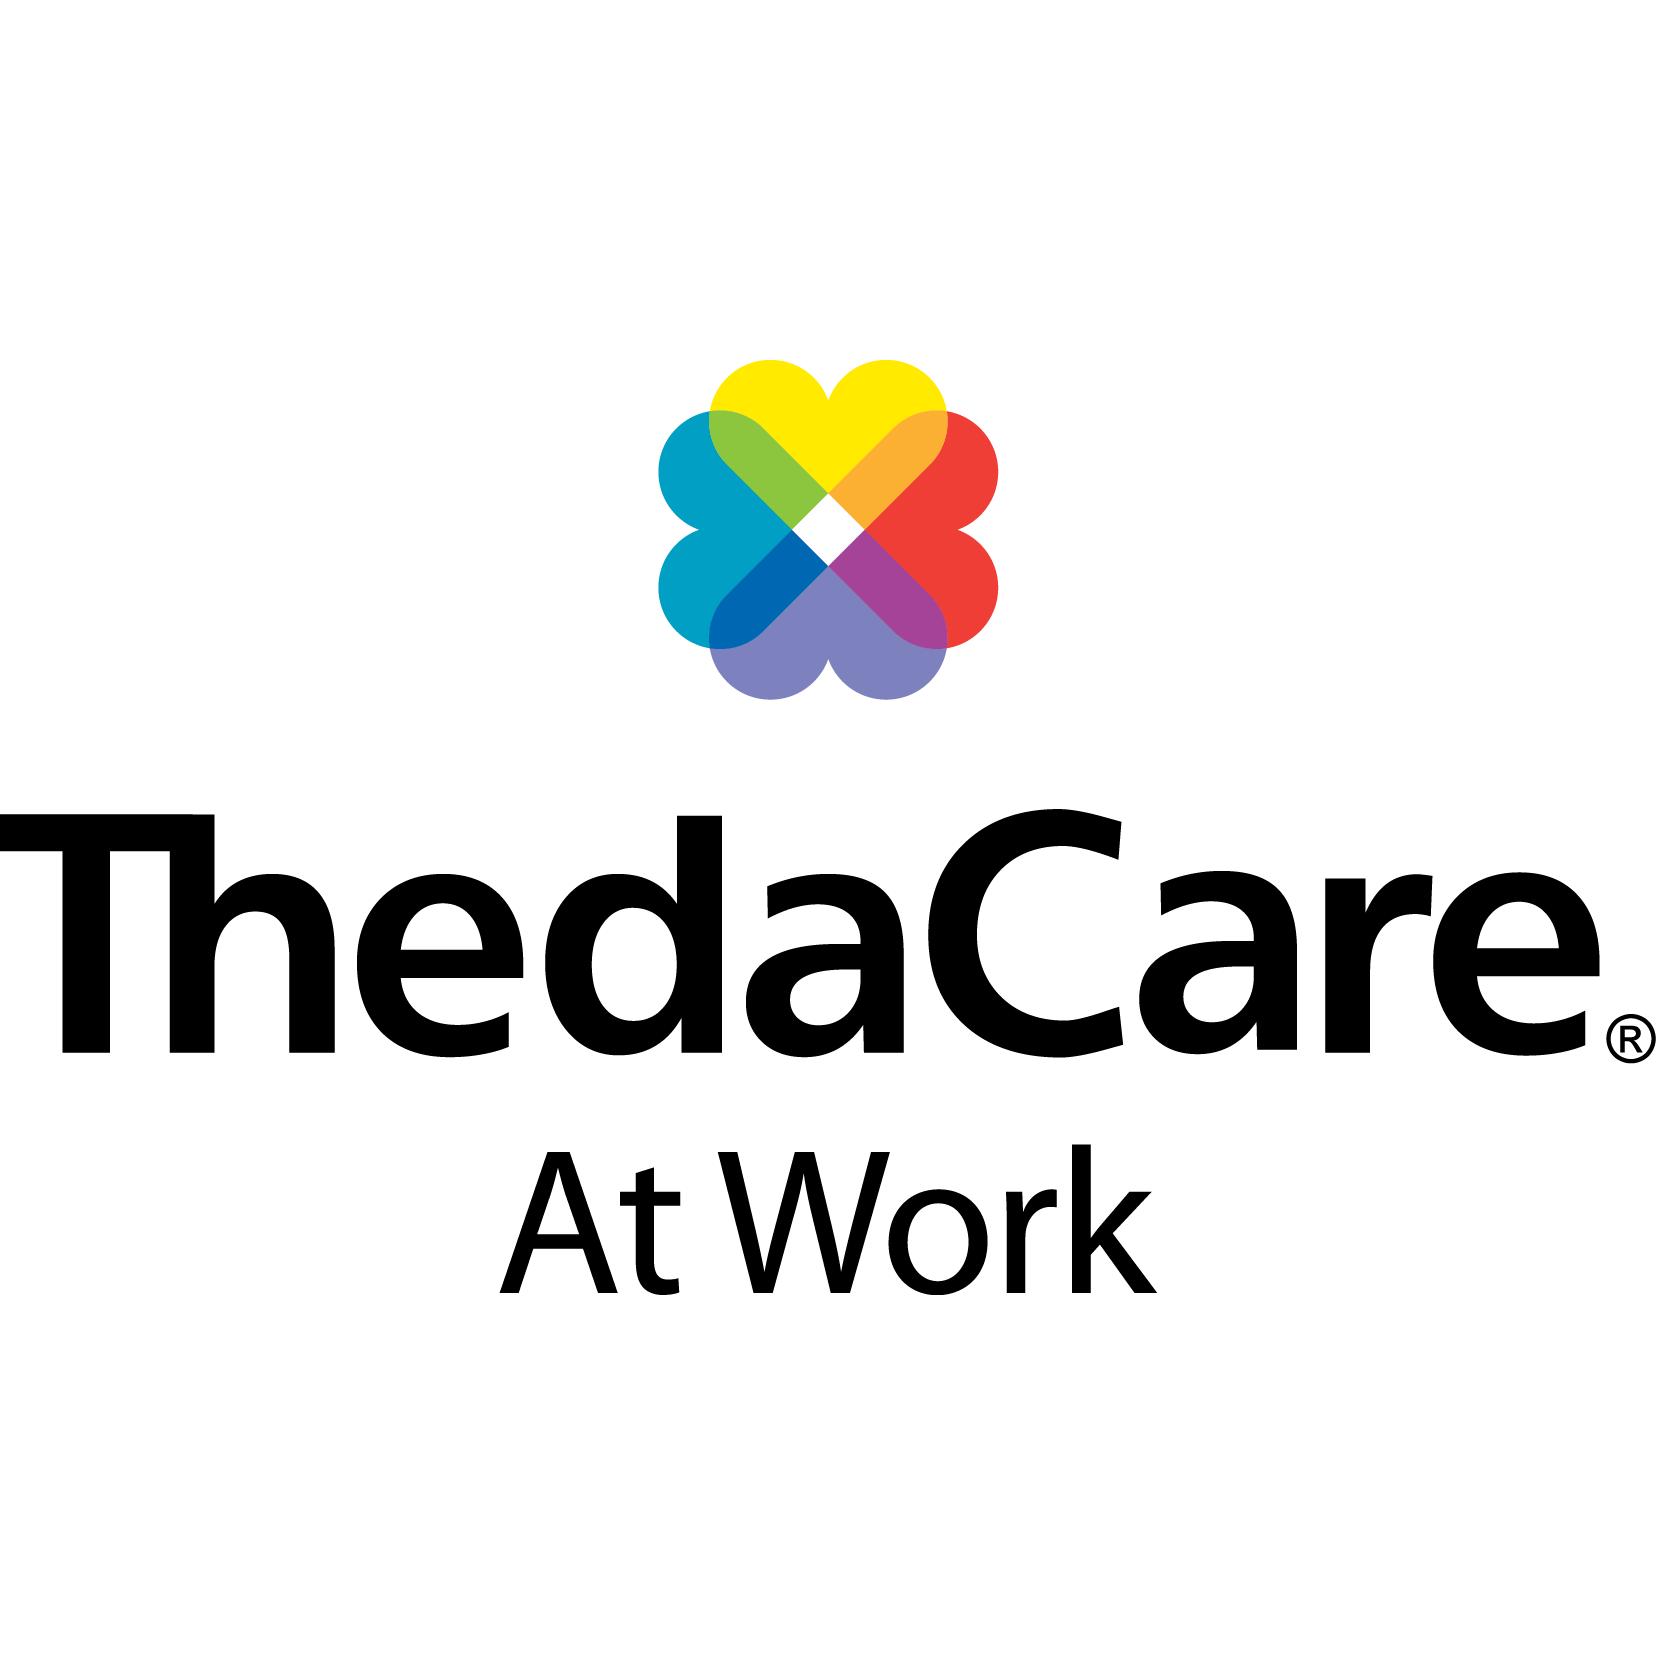 ThedaCare At Work-Occupational Health - Appleton, WI - Occupational Medicine